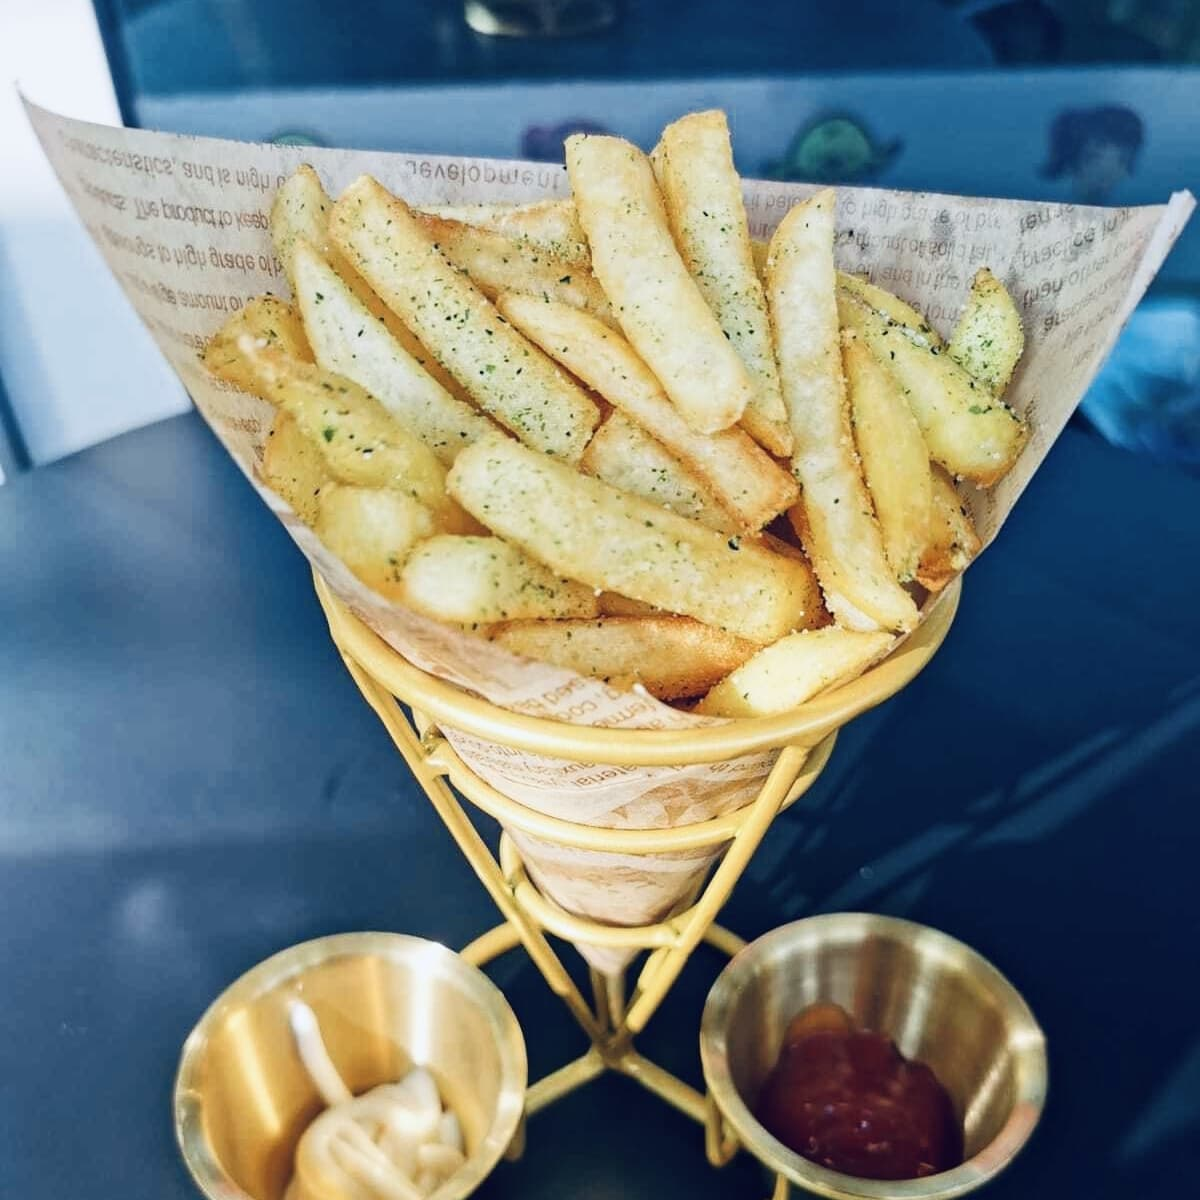 1 x Straight Cut Fries (Regular)